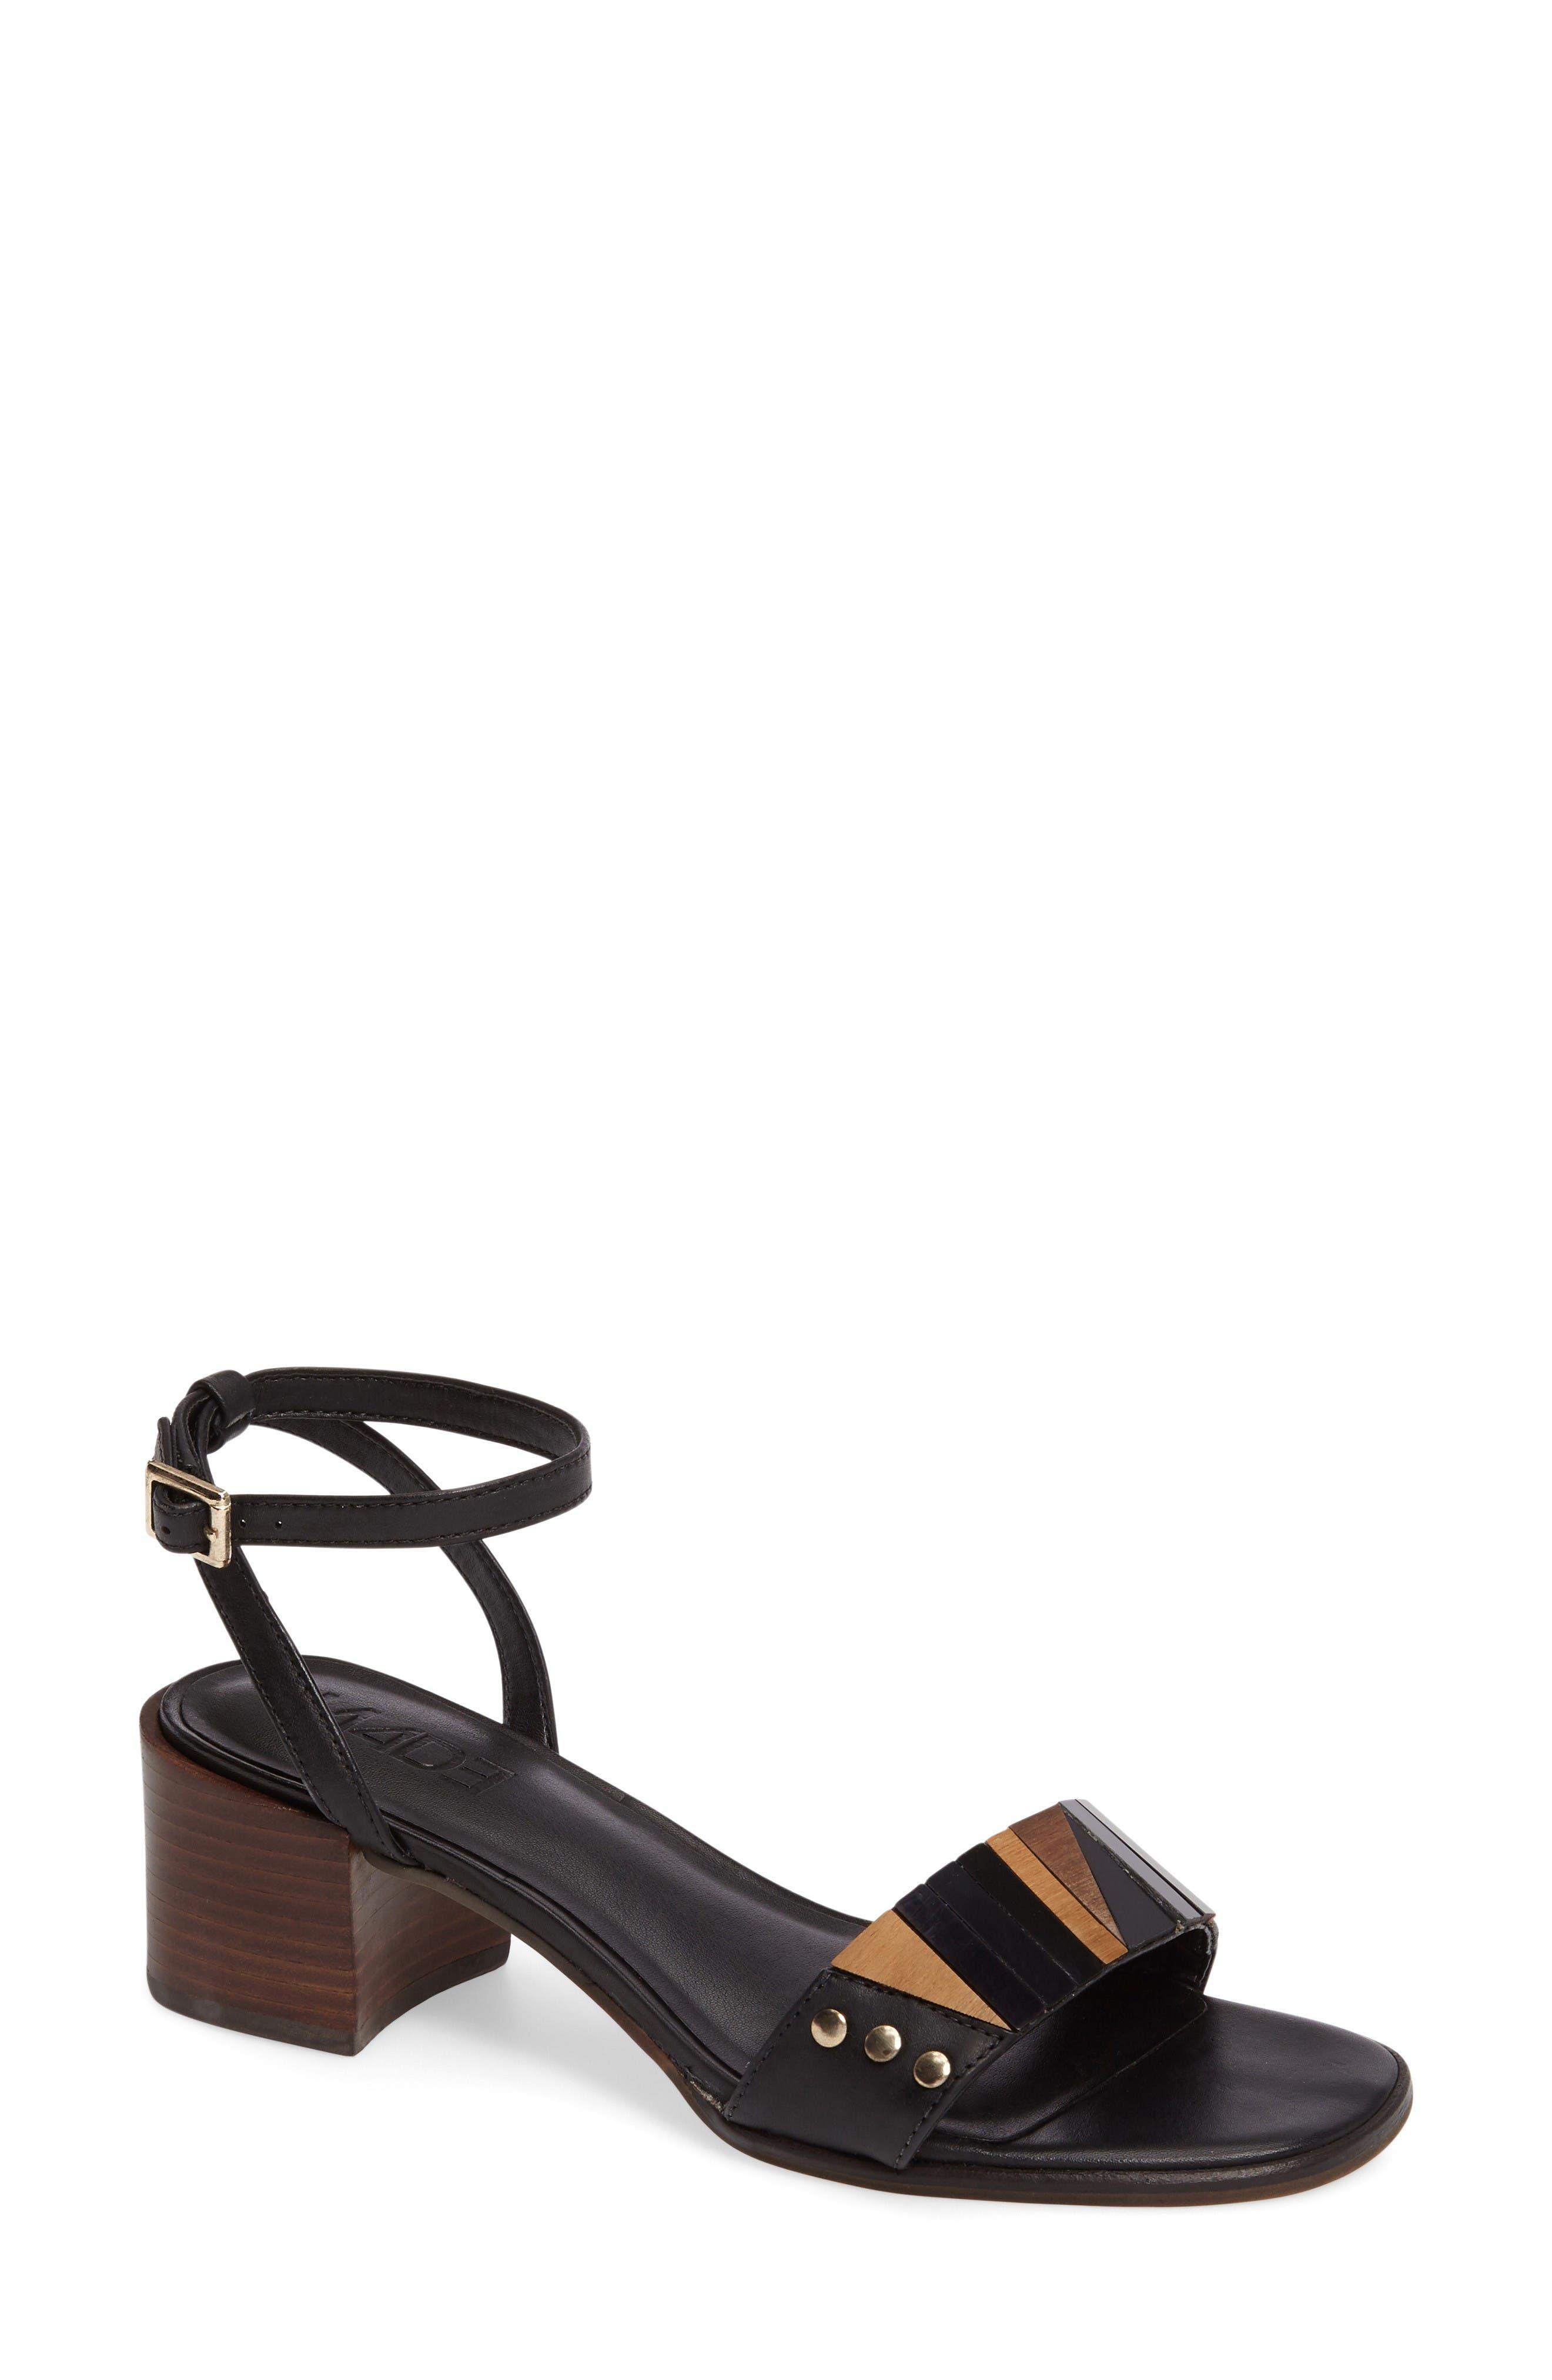 M4D3 FOOTWEAR M4D3 Summer Block Heel Sandal